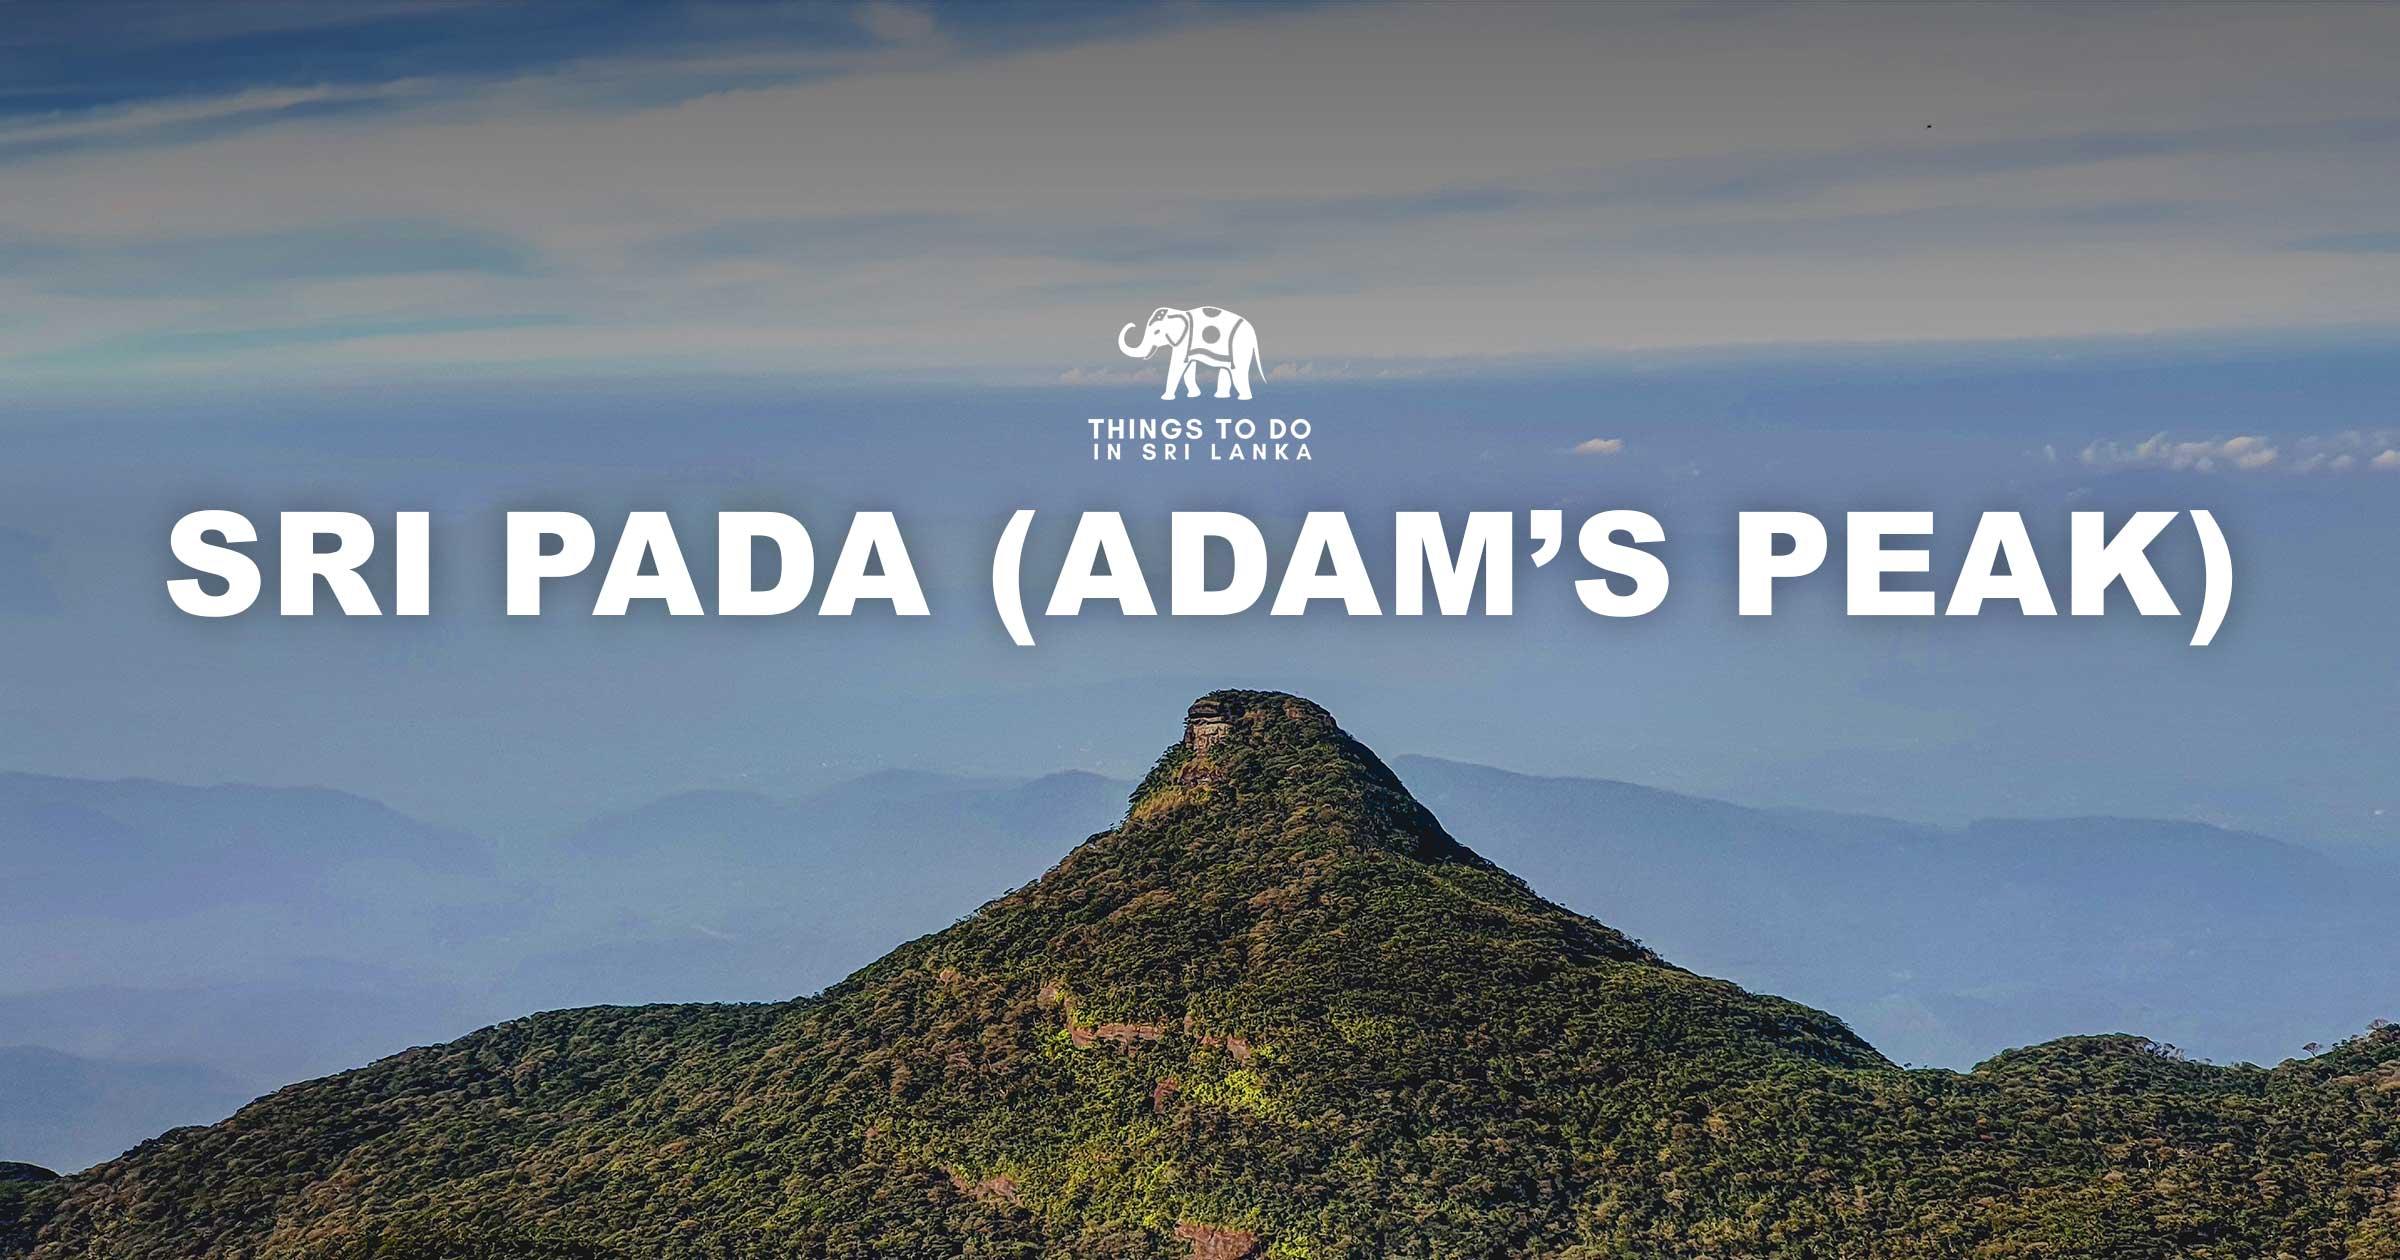 Sri Pada - Adam's Peak